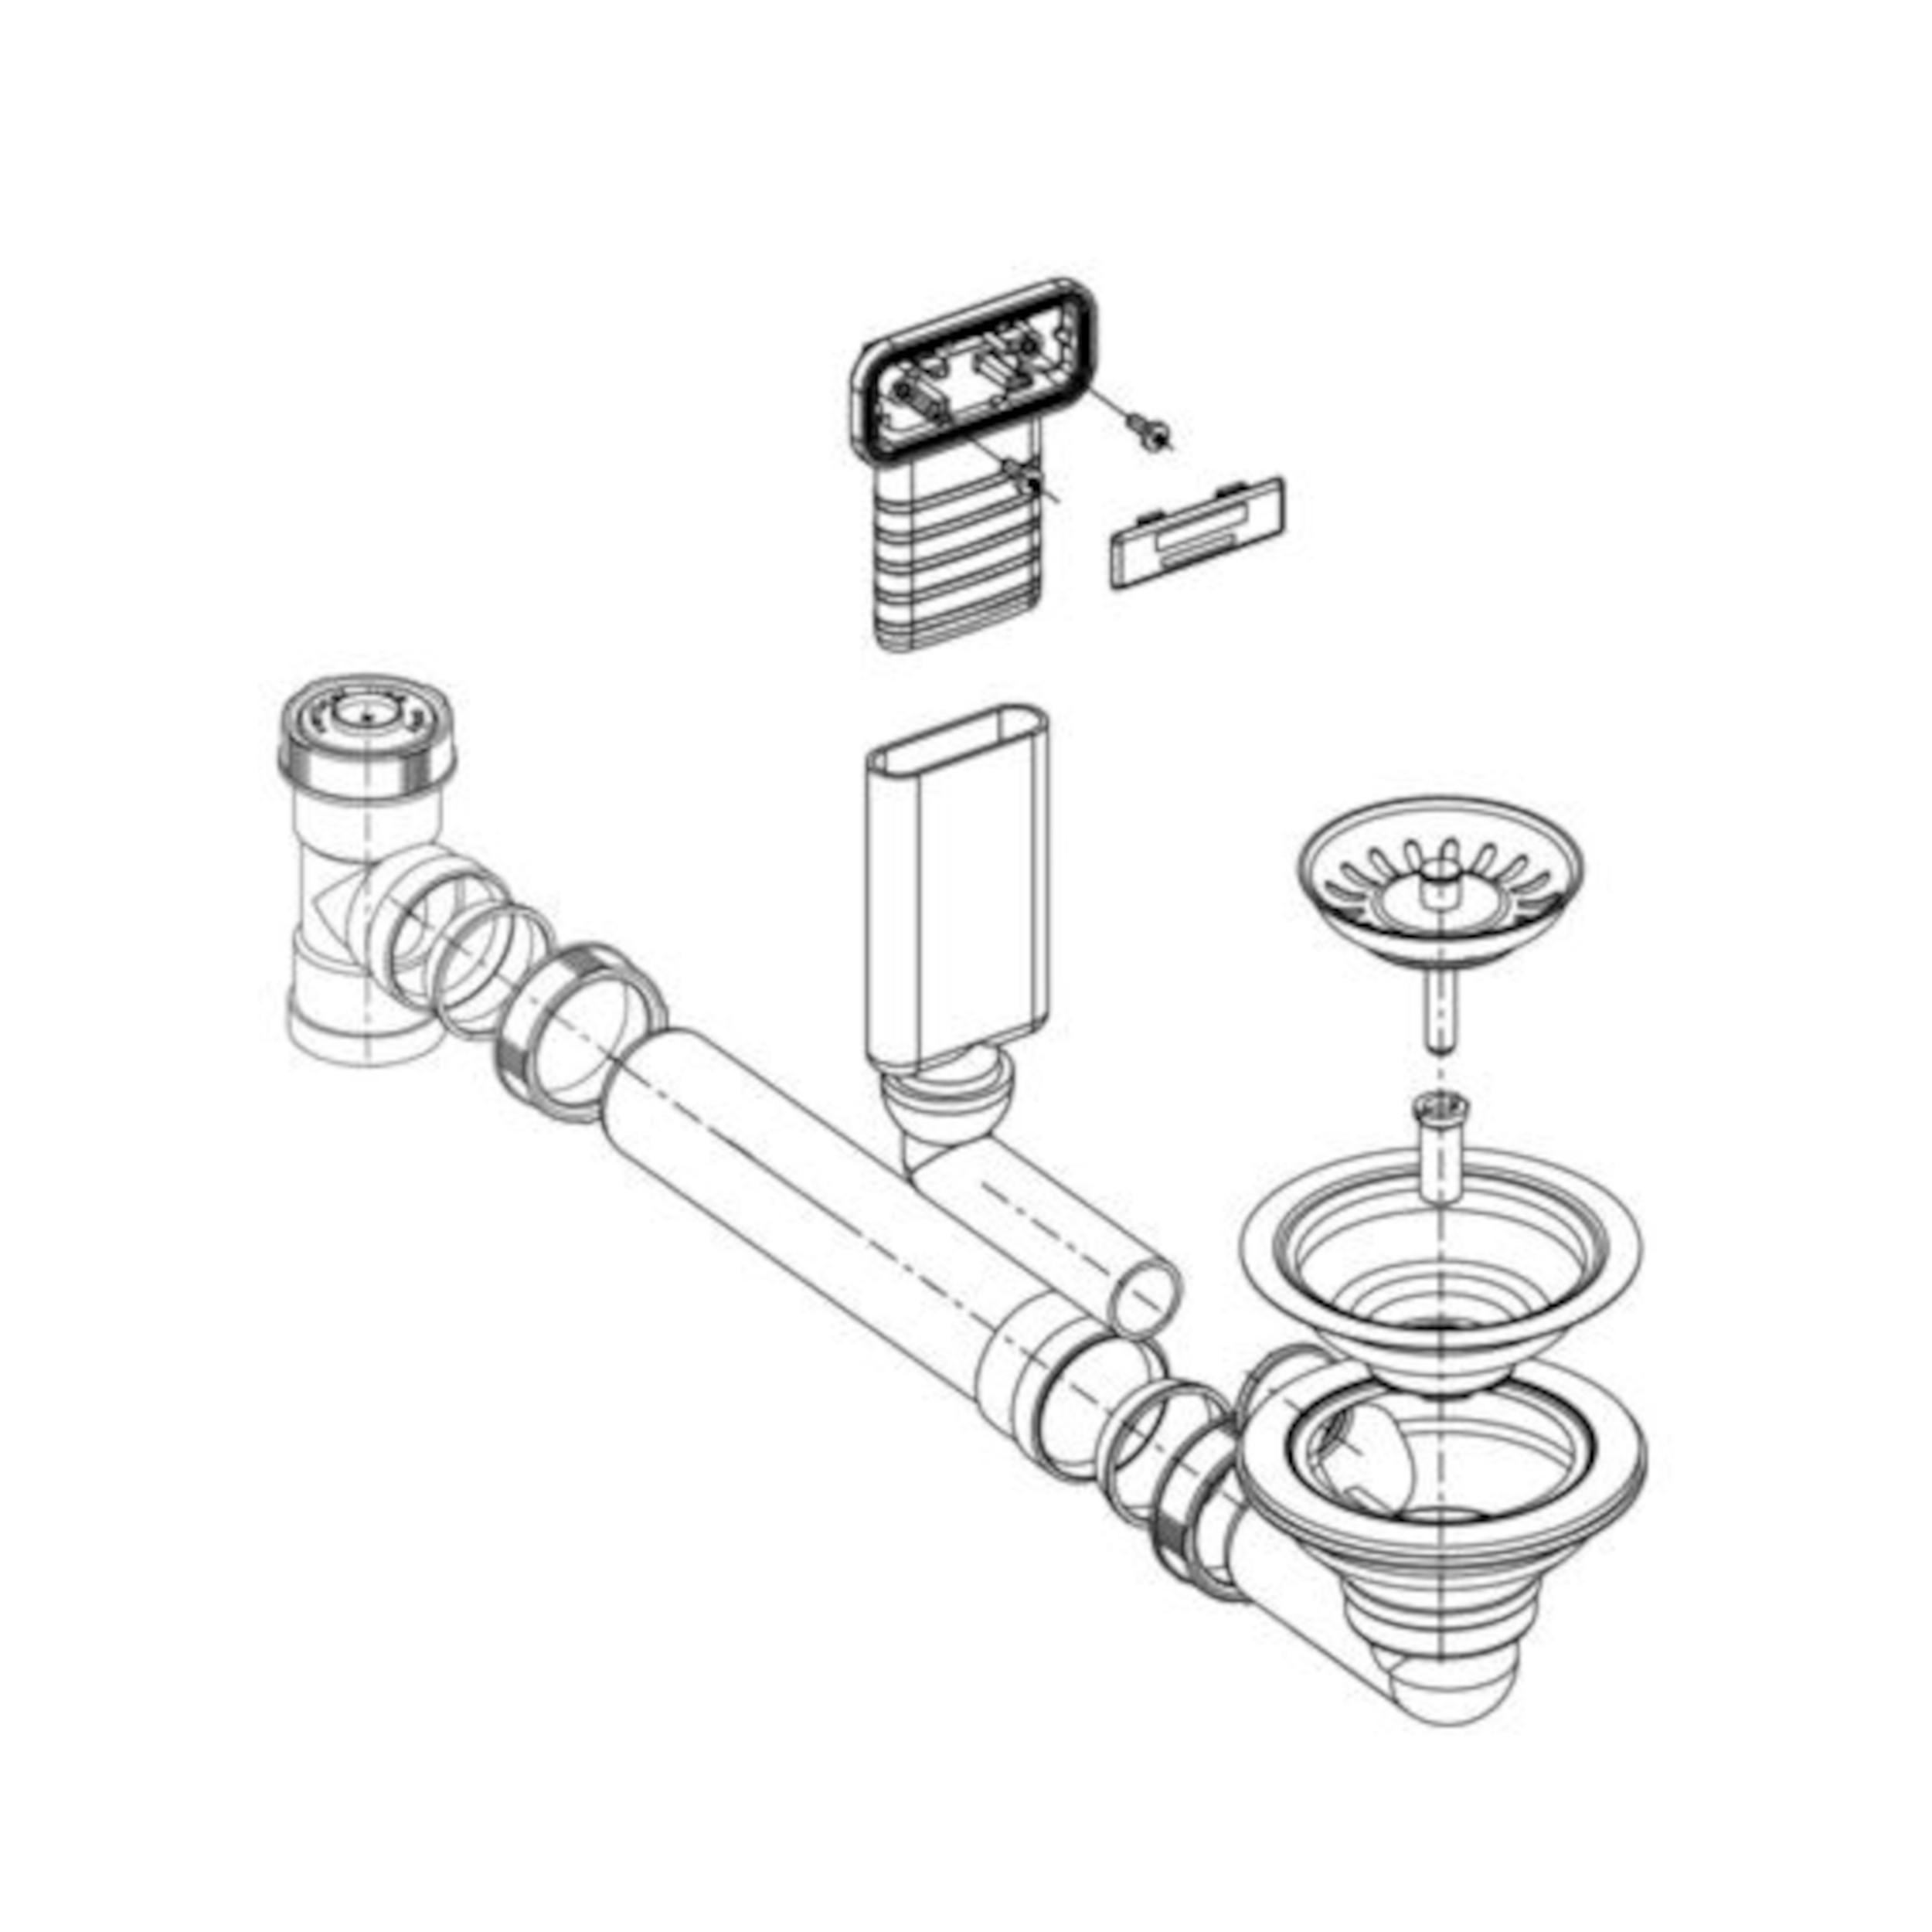 BLANCO Ablaufgarnitur 1 x 3,5'' ohne Ablauffernbedienung C-overflow modernes Sieb 225078